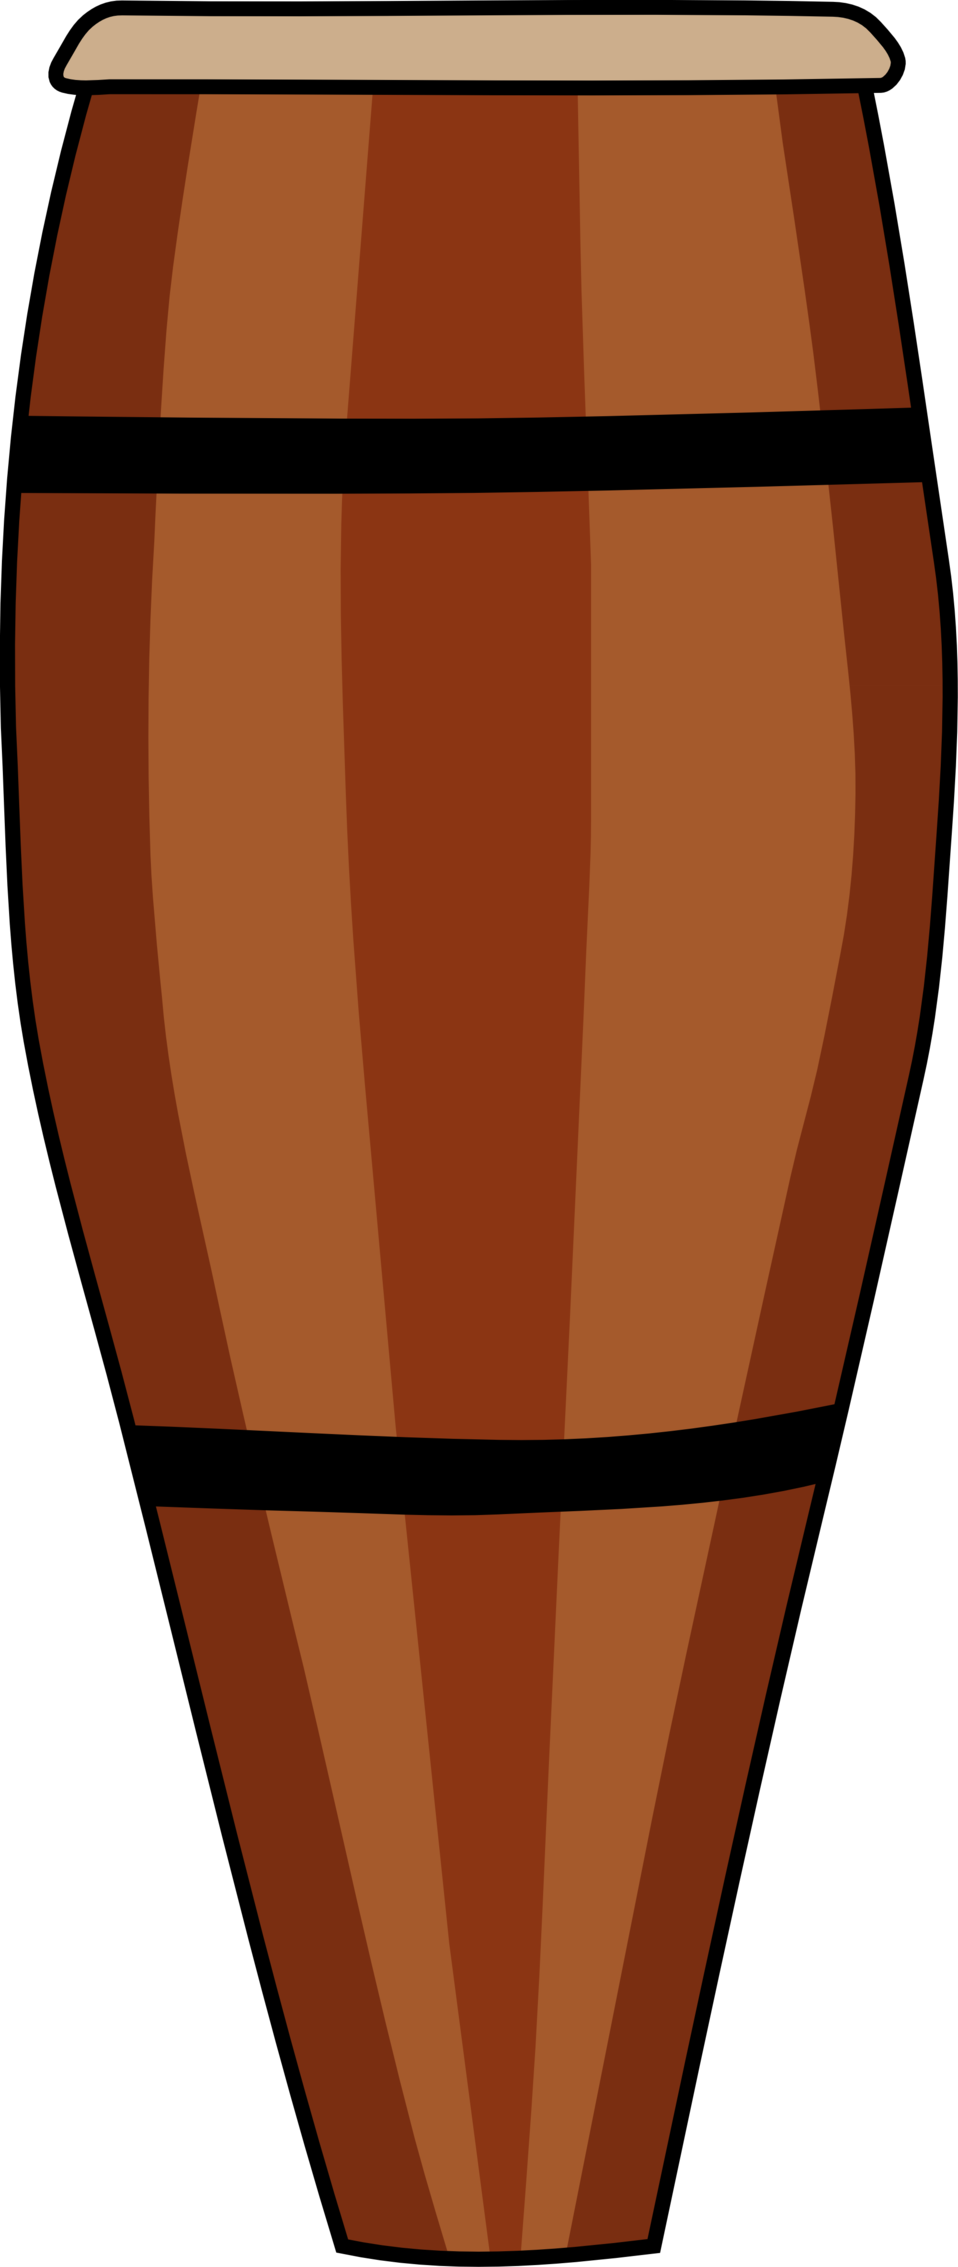 Atabaque